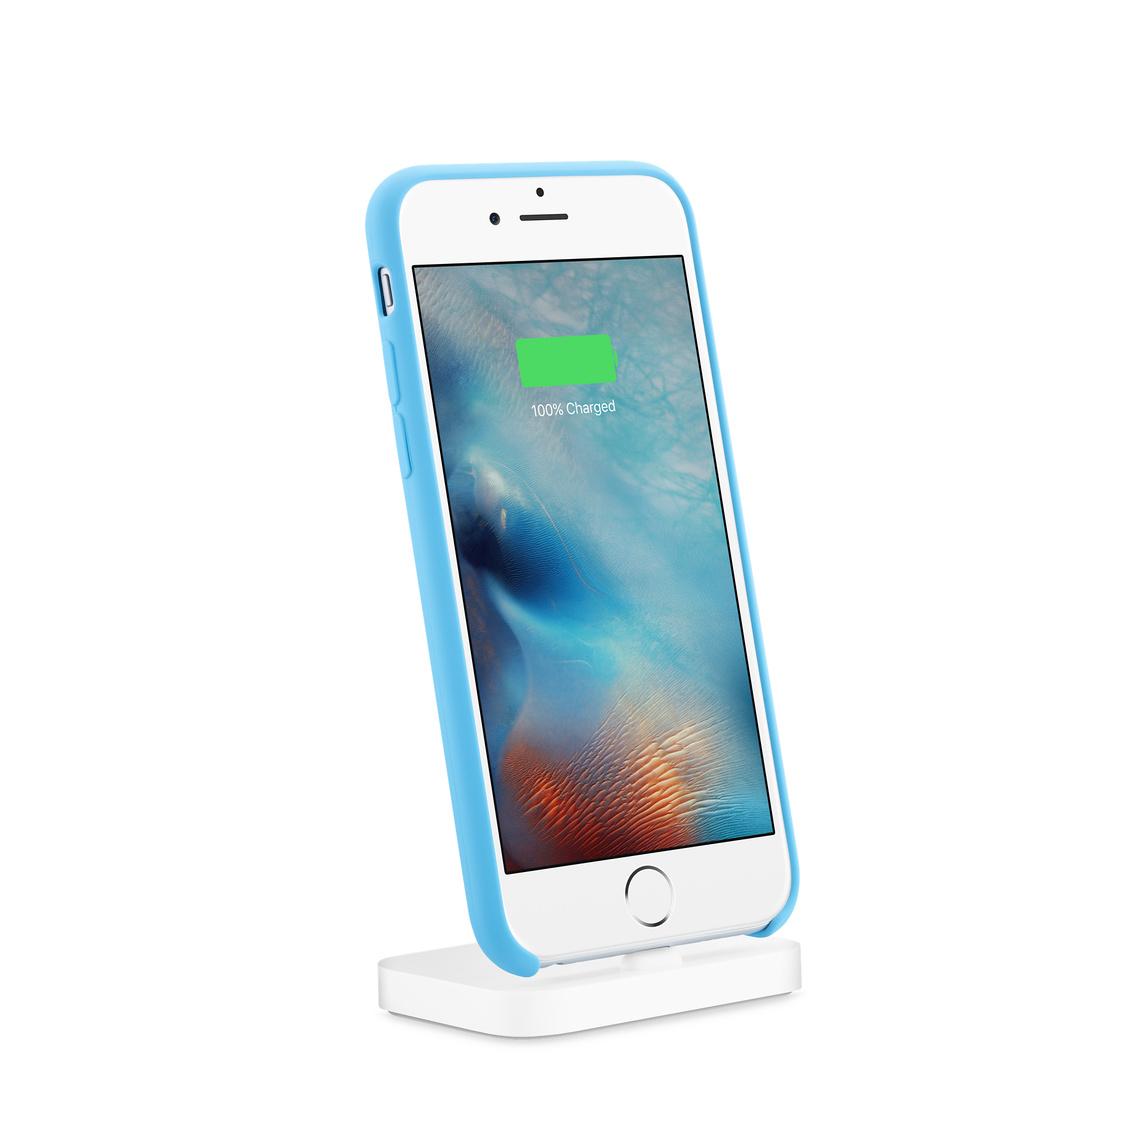 4f98b2e1d5171c iPhone Lightning Dock - White - Apple (CA)